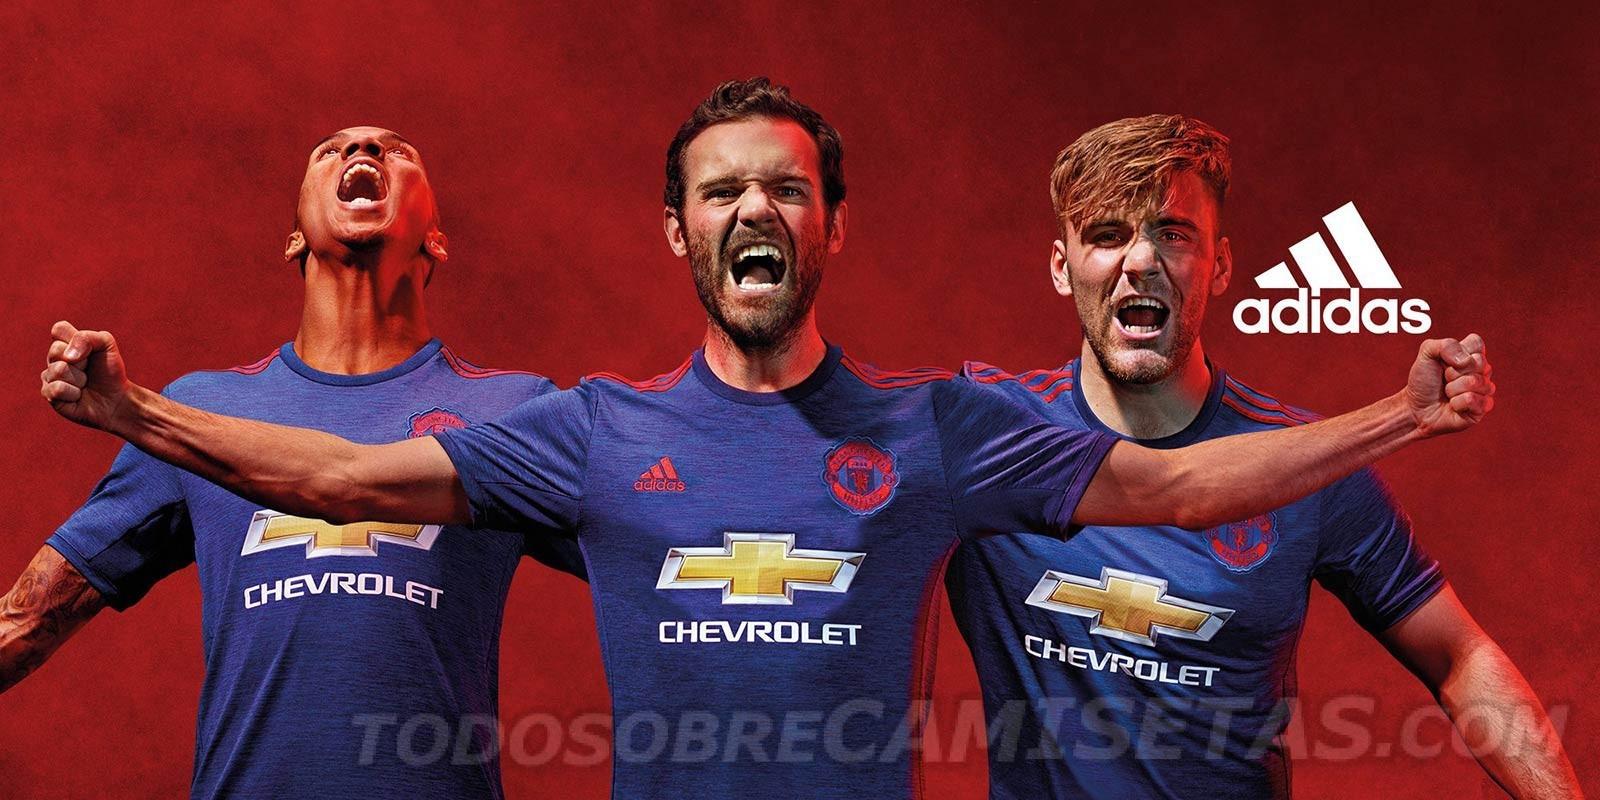 Manchester-United-2016-17-adidas-new-away-kit-2.jpg